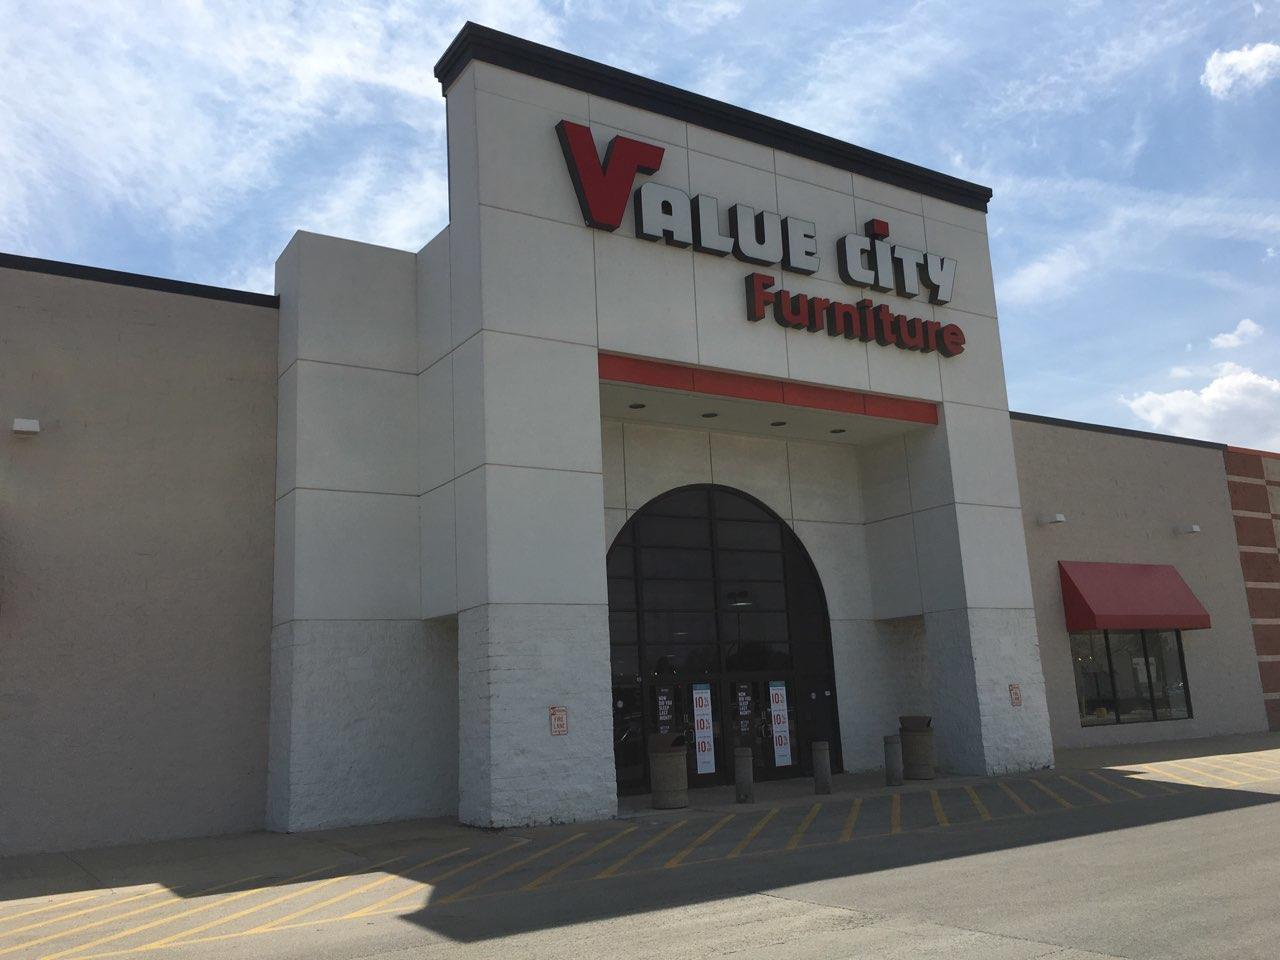 Value City Furniture image 5